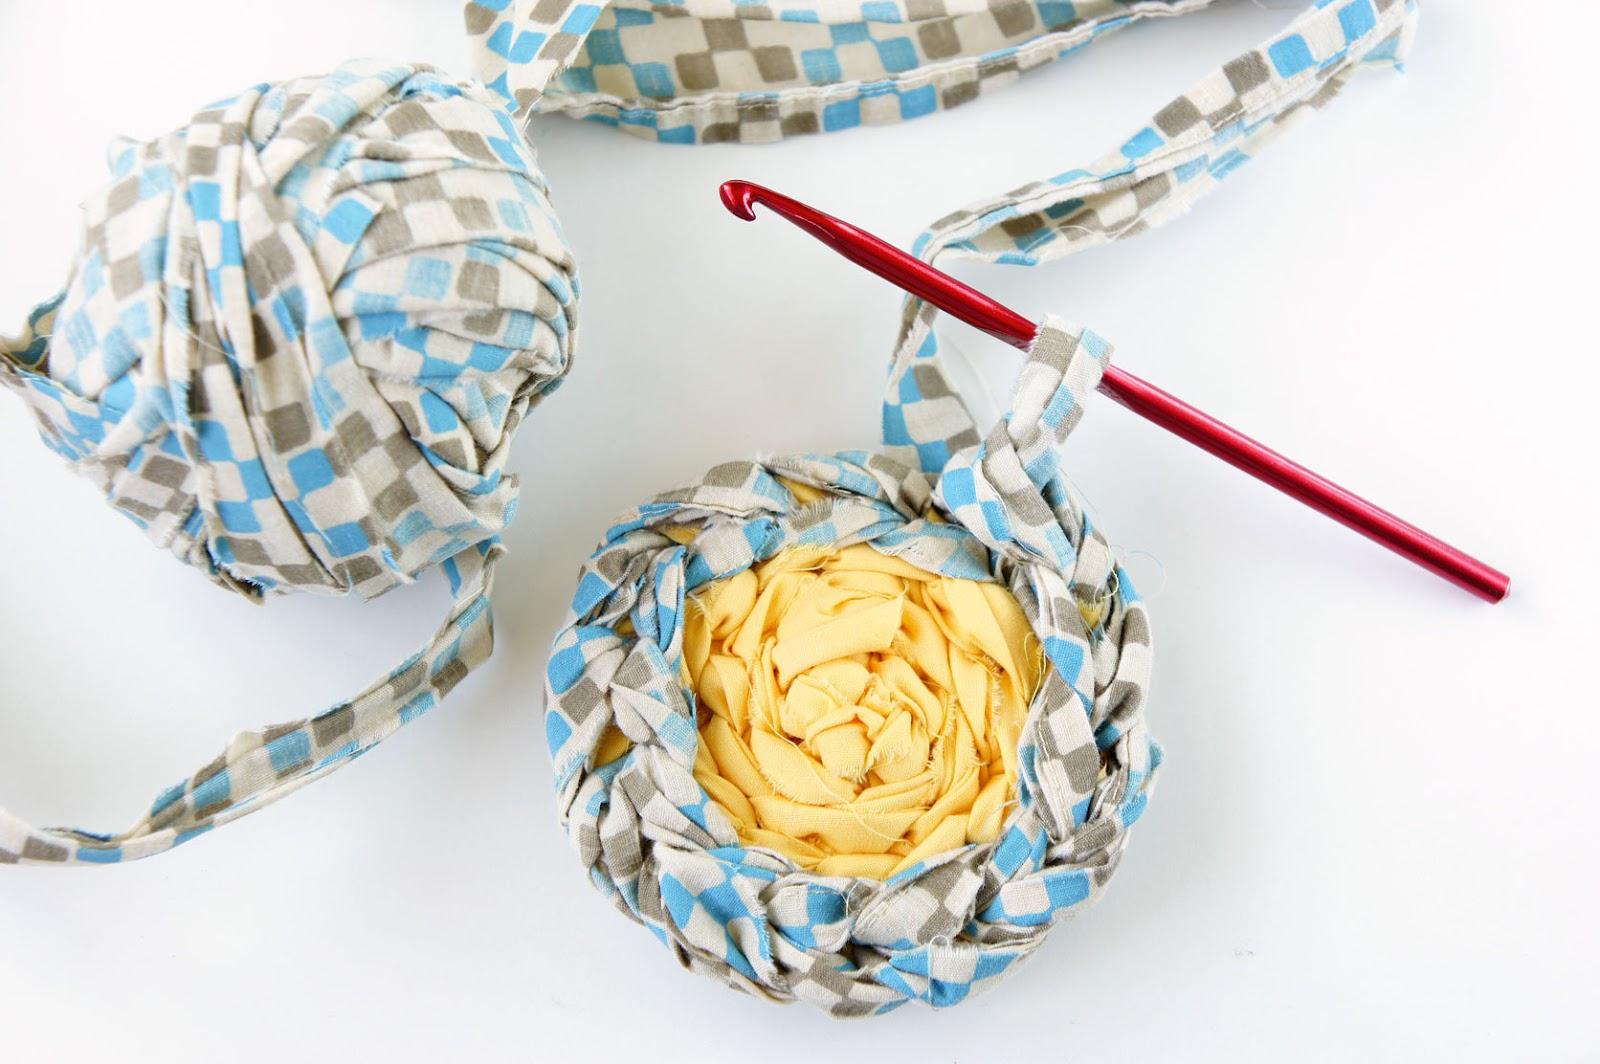 Crochet Rag Rug : DIY: crocheted rag rug part 3